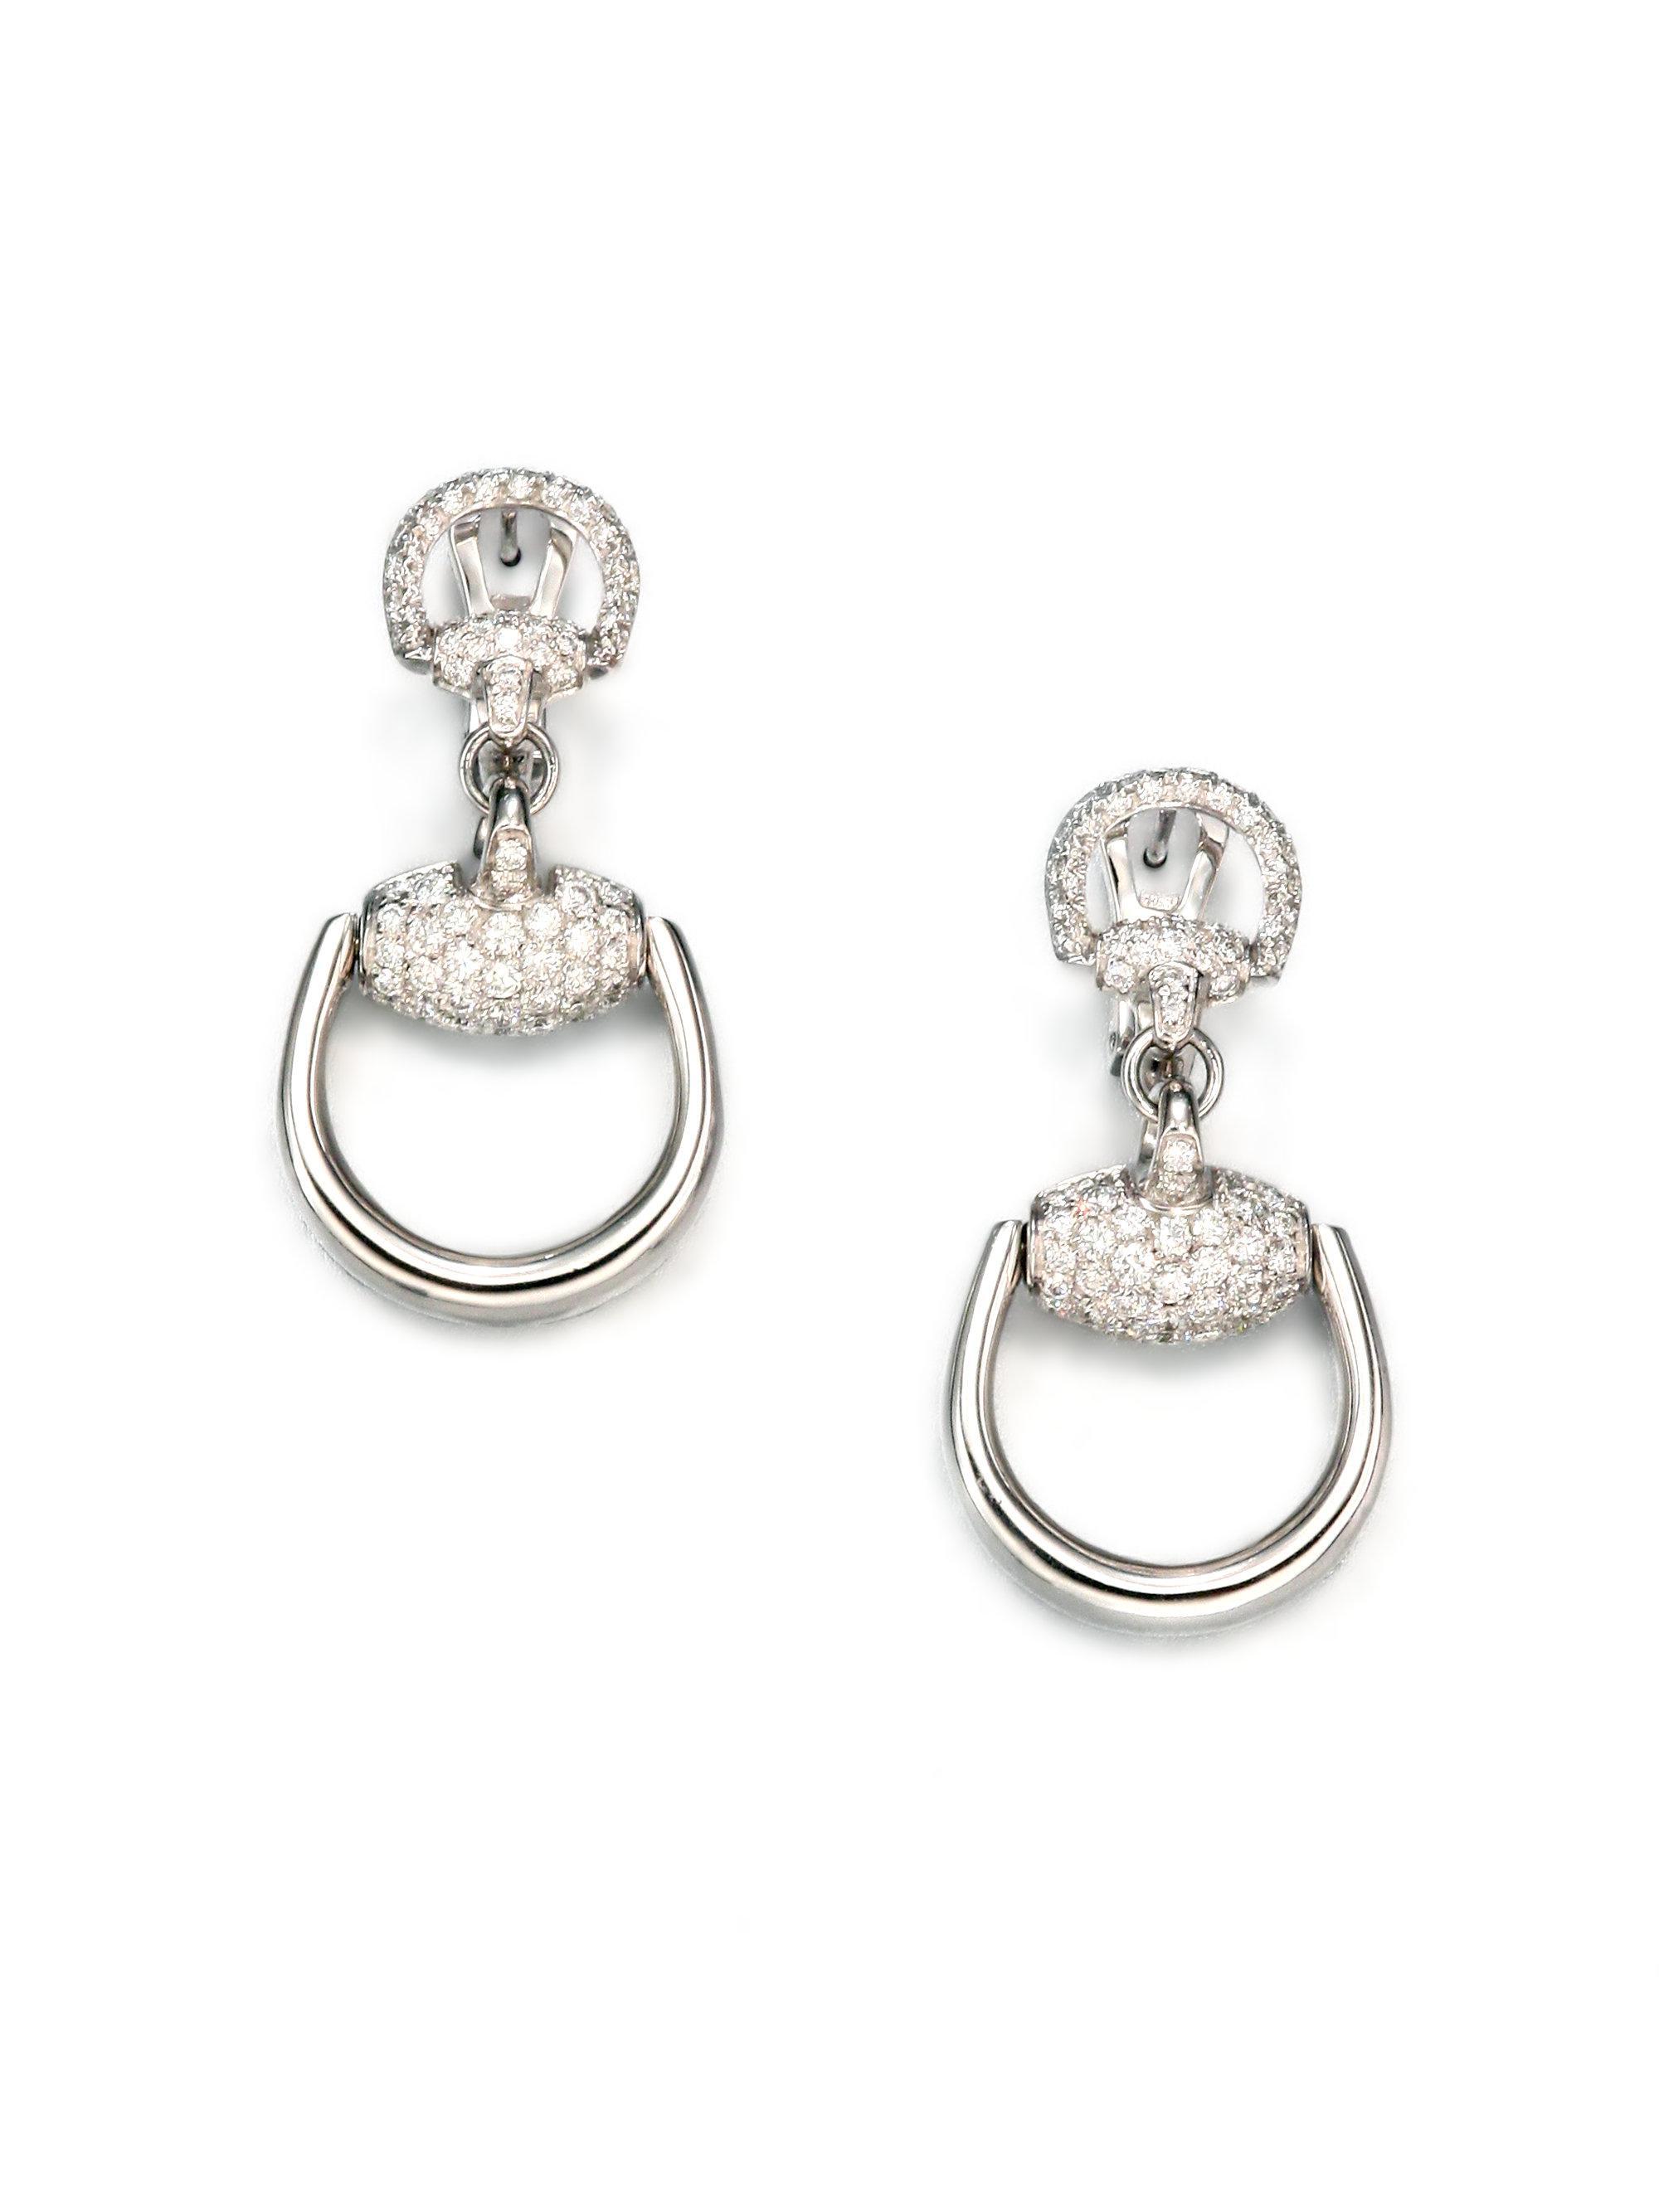 Elements Gold Vine Drop Earrings - White Gold/Gold Silver (Colour) jXdVhH4Xy